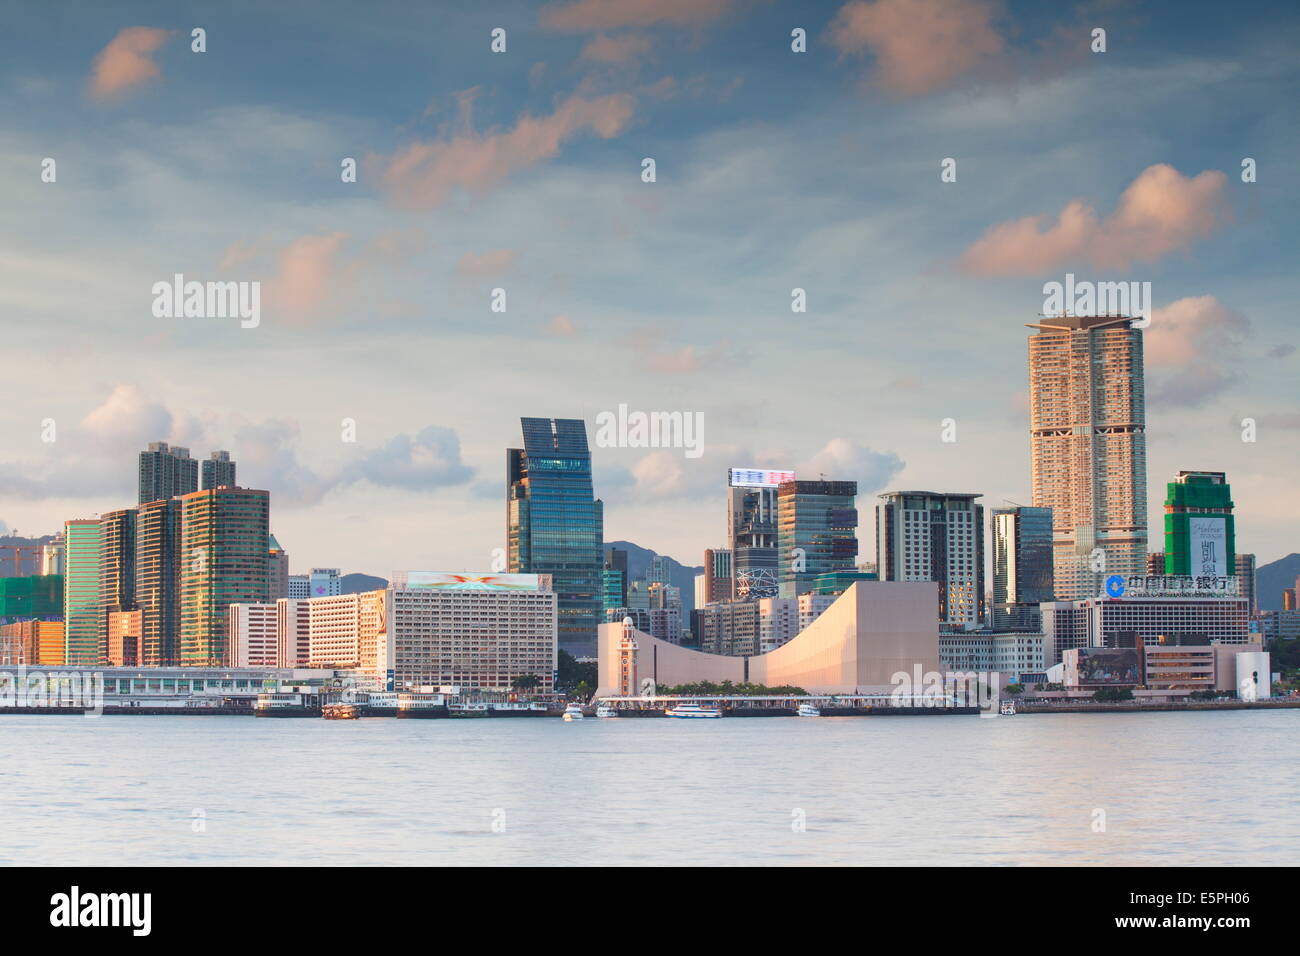 View of Tsim Sha Tsui skyline, Kowloon, Hong Kong, China, Asia - Stock Image